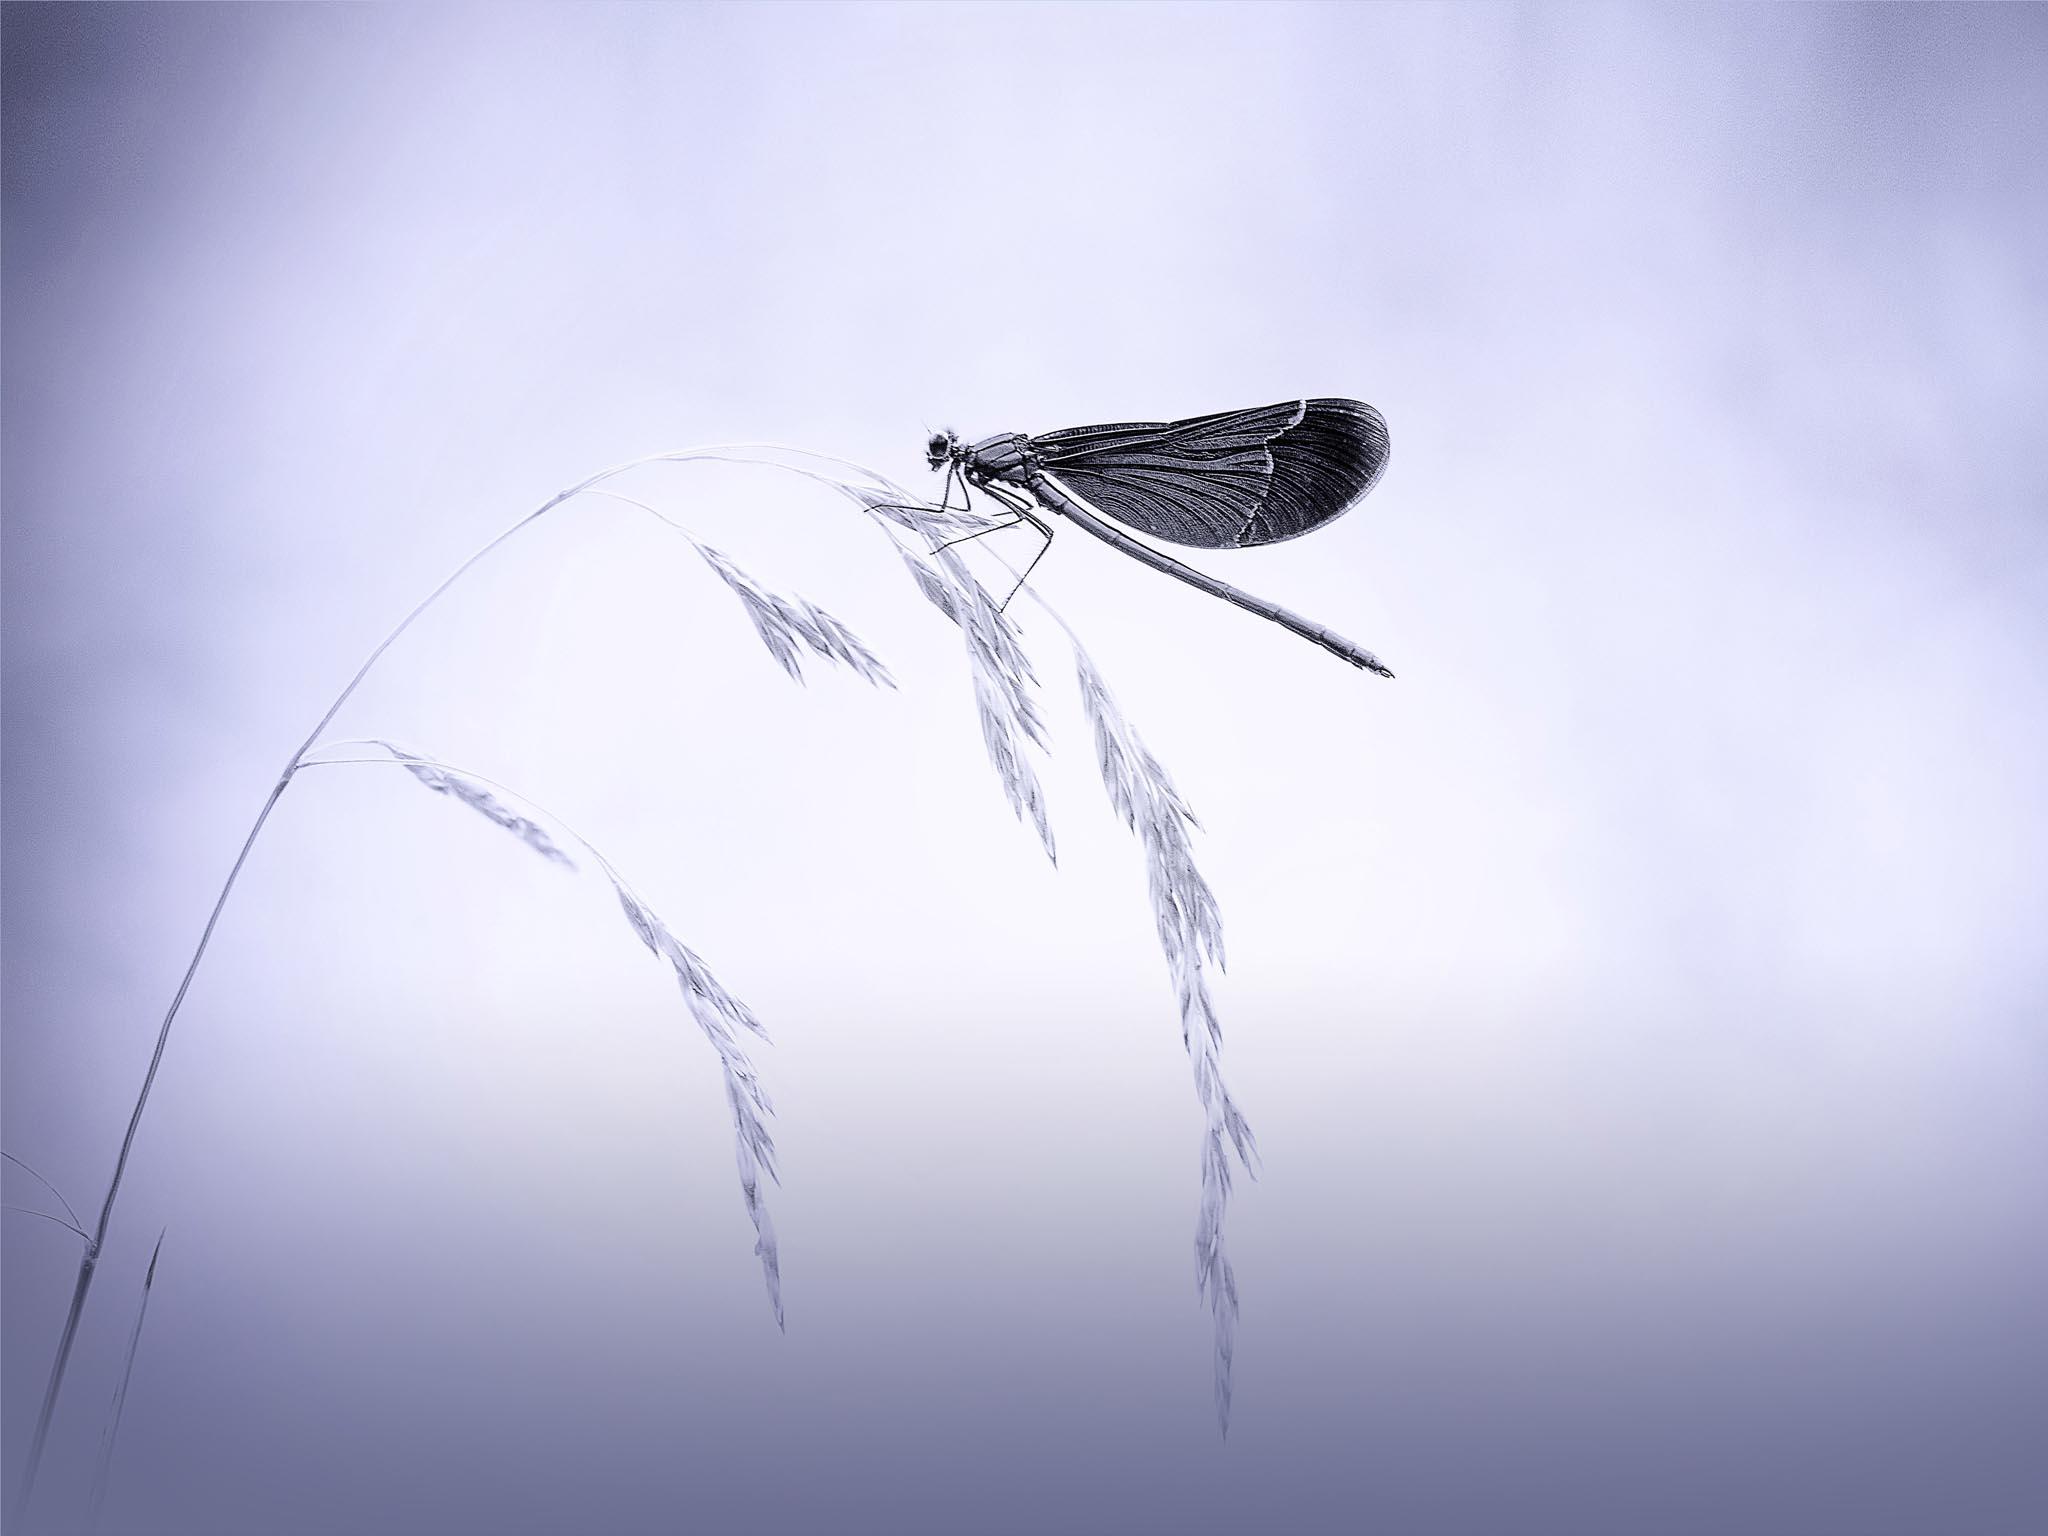 FotoclubWolfratshausen_B1_MihailowitschPia_dragonfly